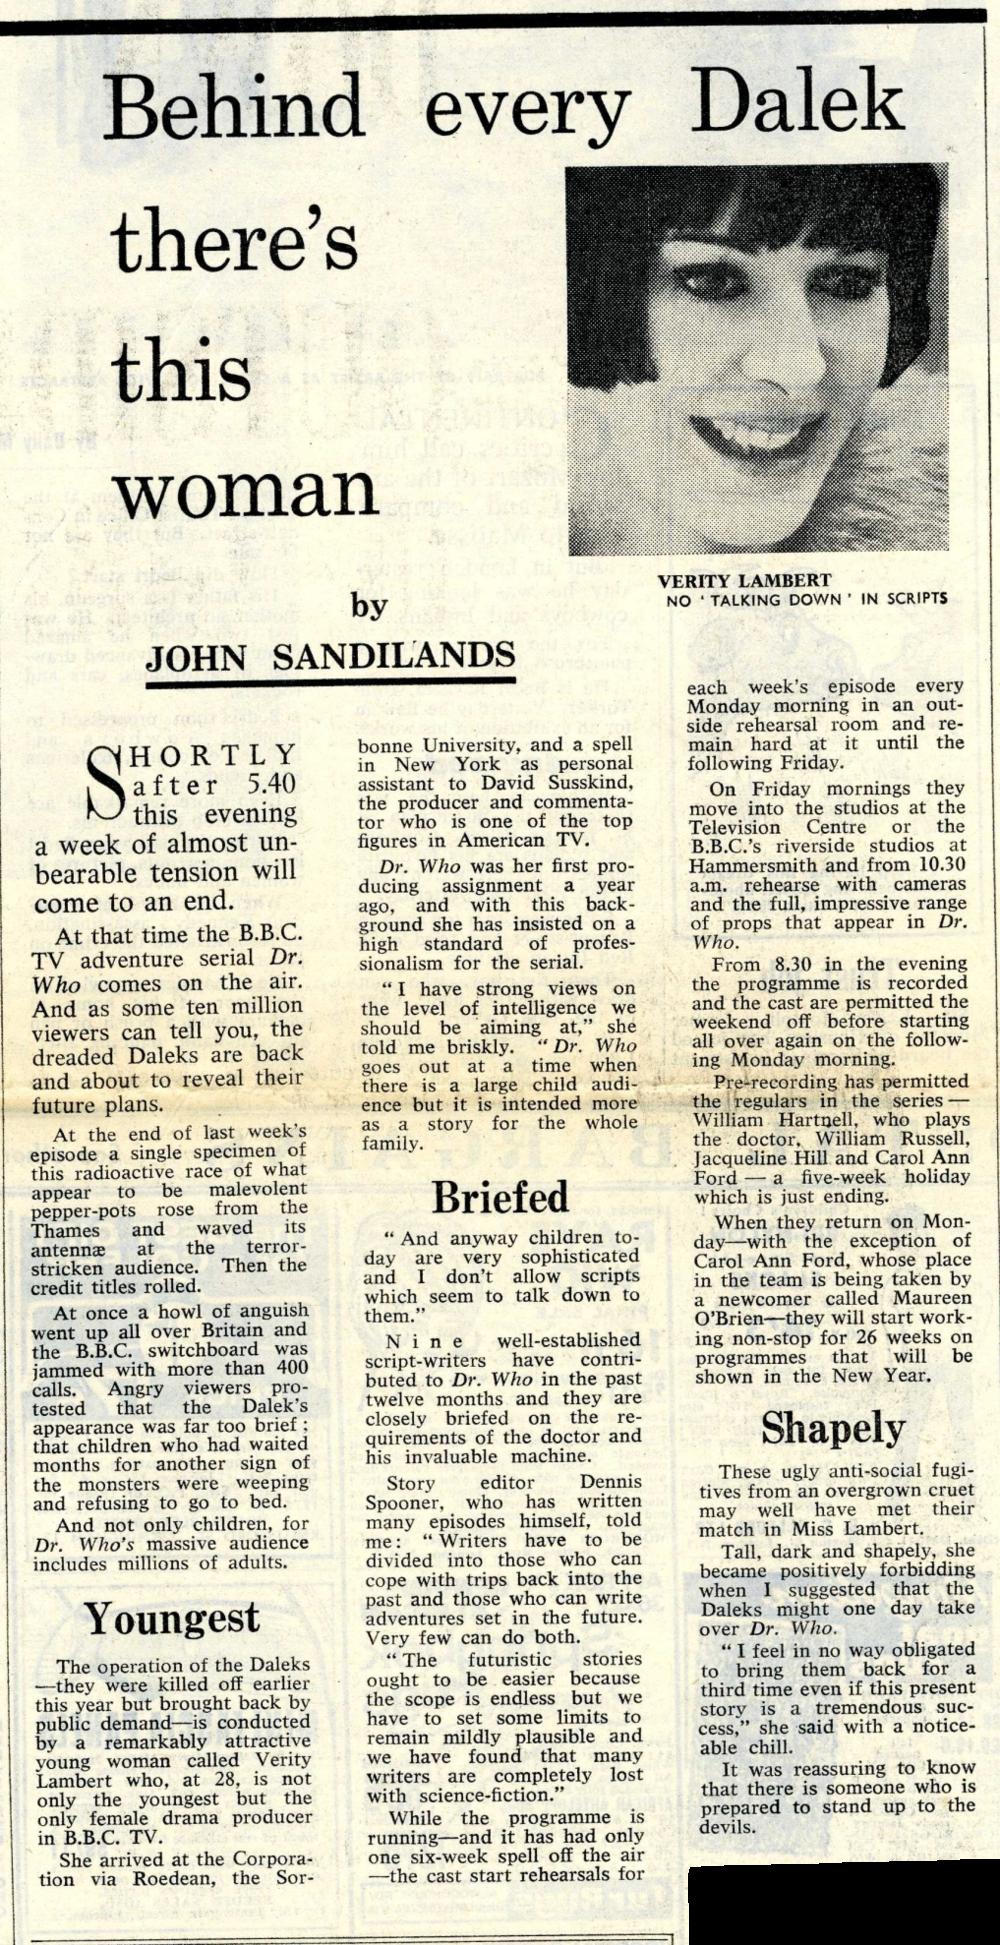 Daily Mail, 26 November 1964